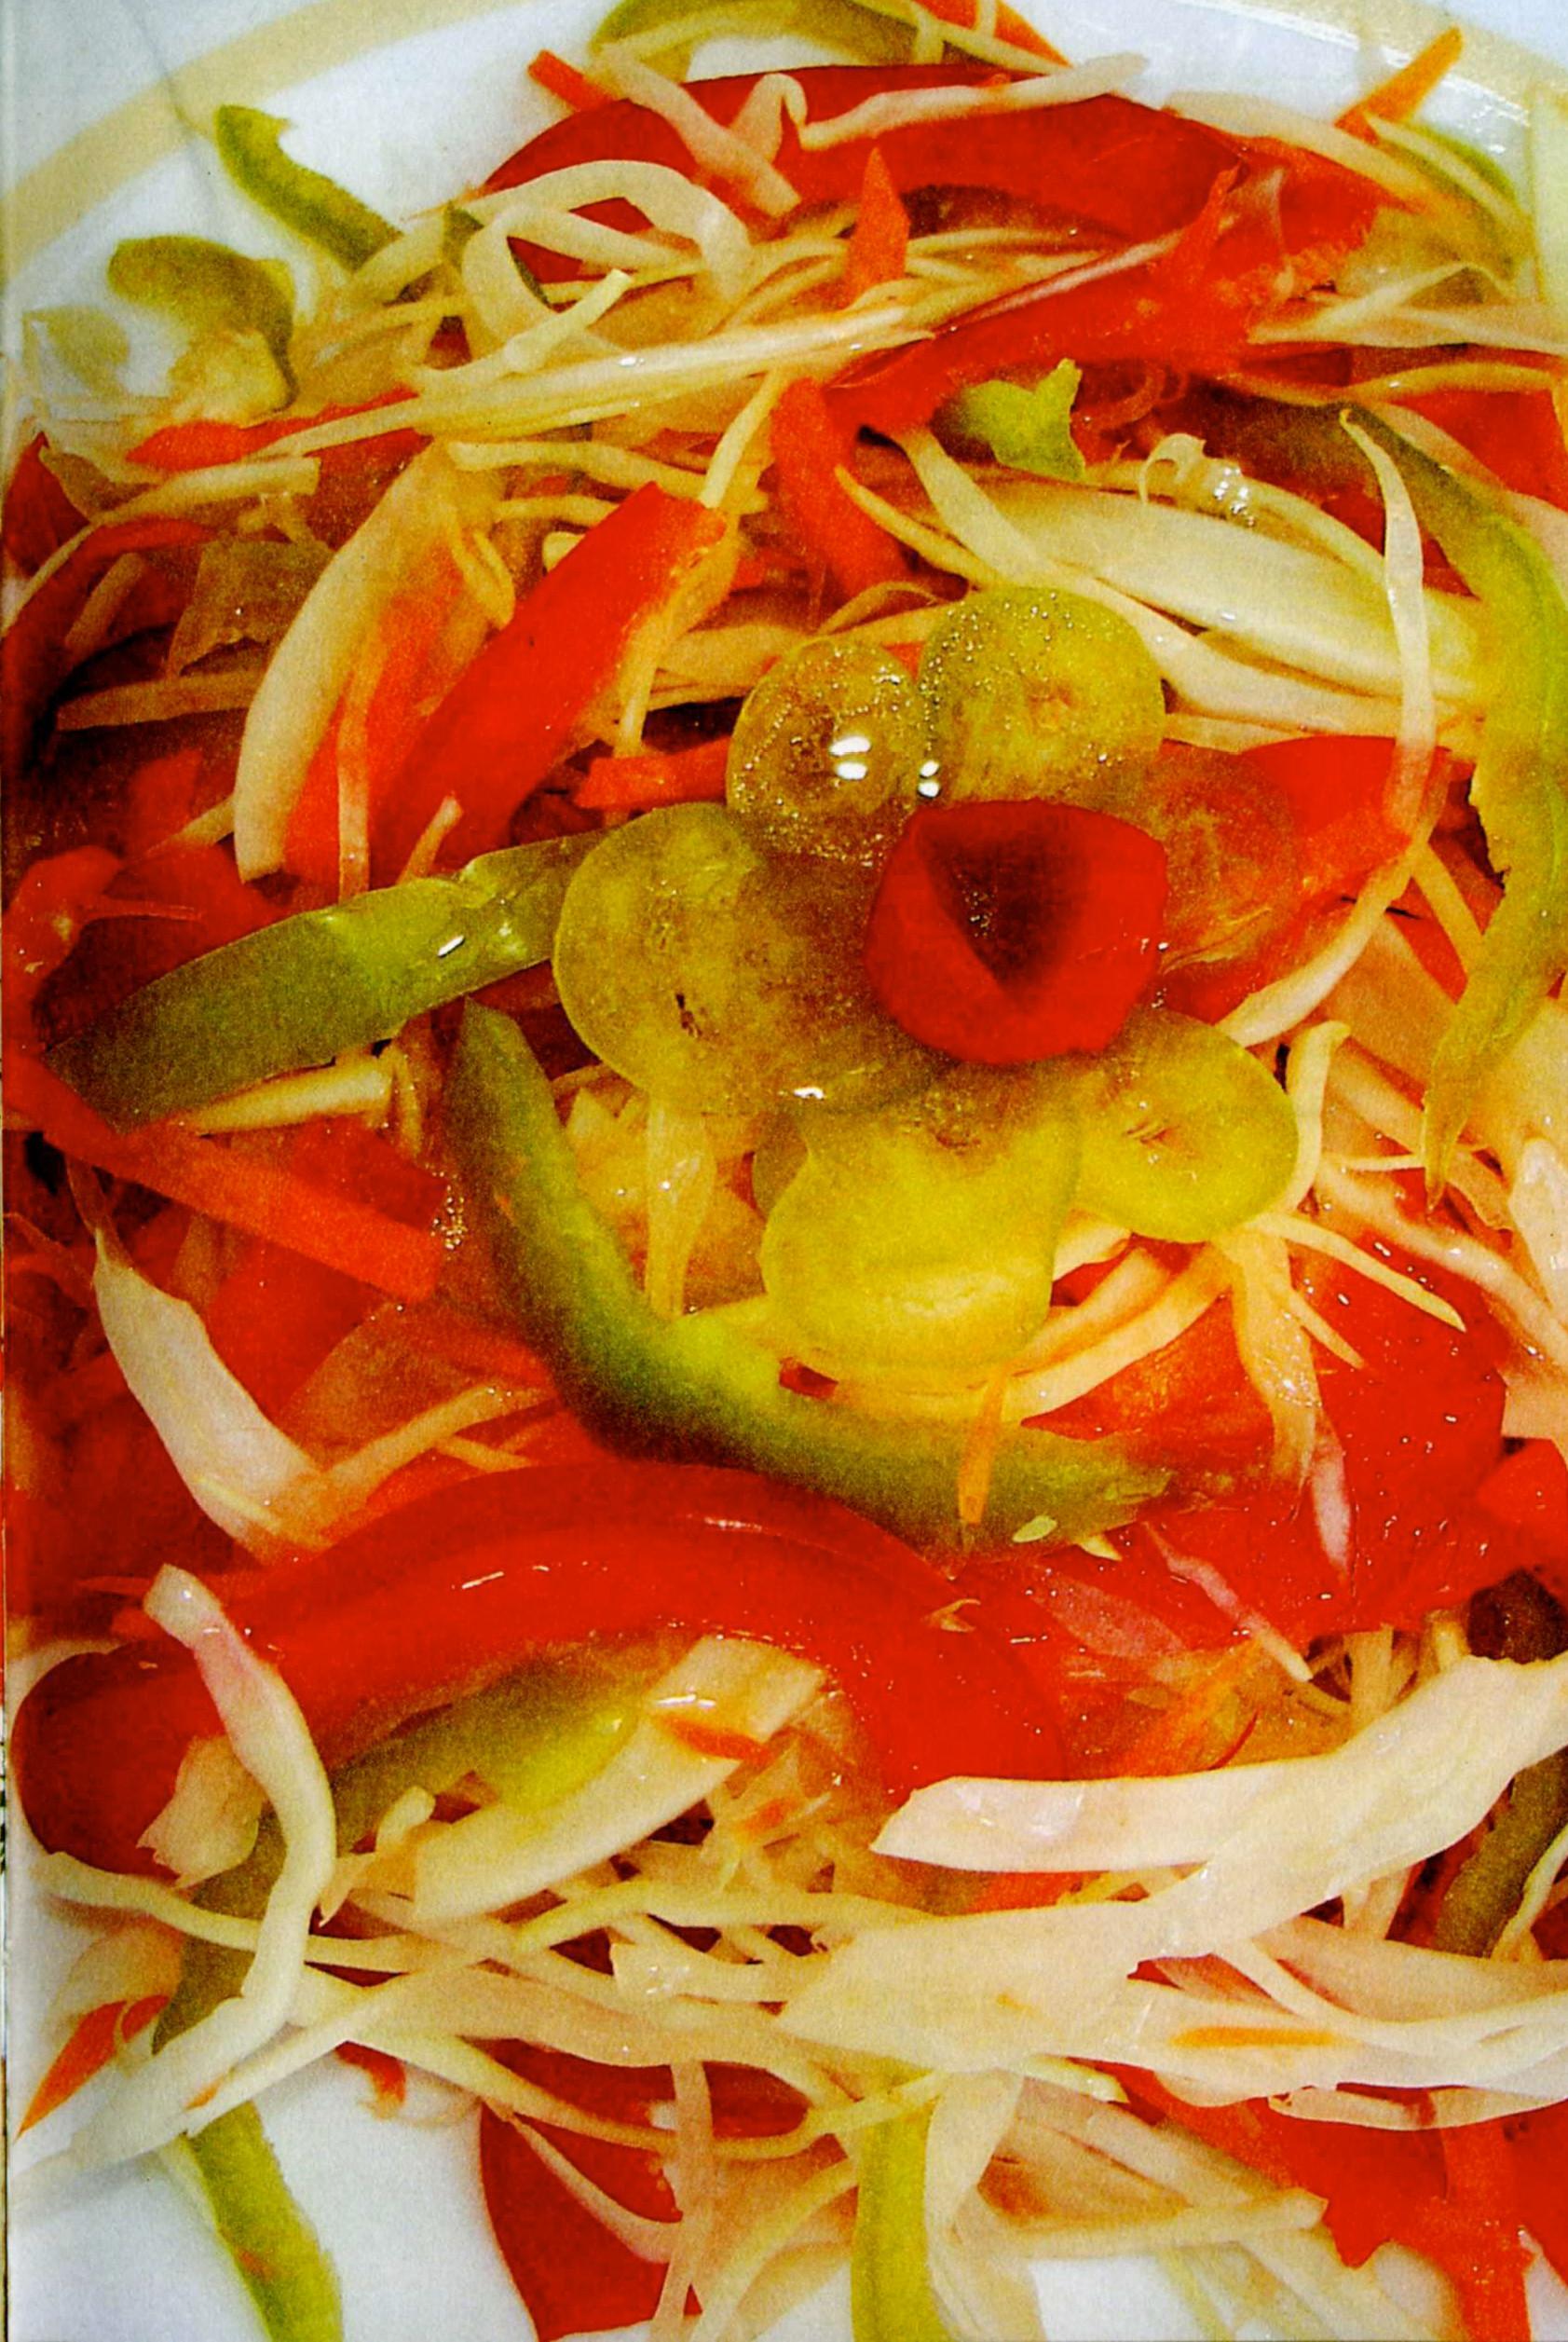 Ovoshhnoy salat iz seldereya pertsa i kapustyi Салат с картофелем, сырком и морковкой